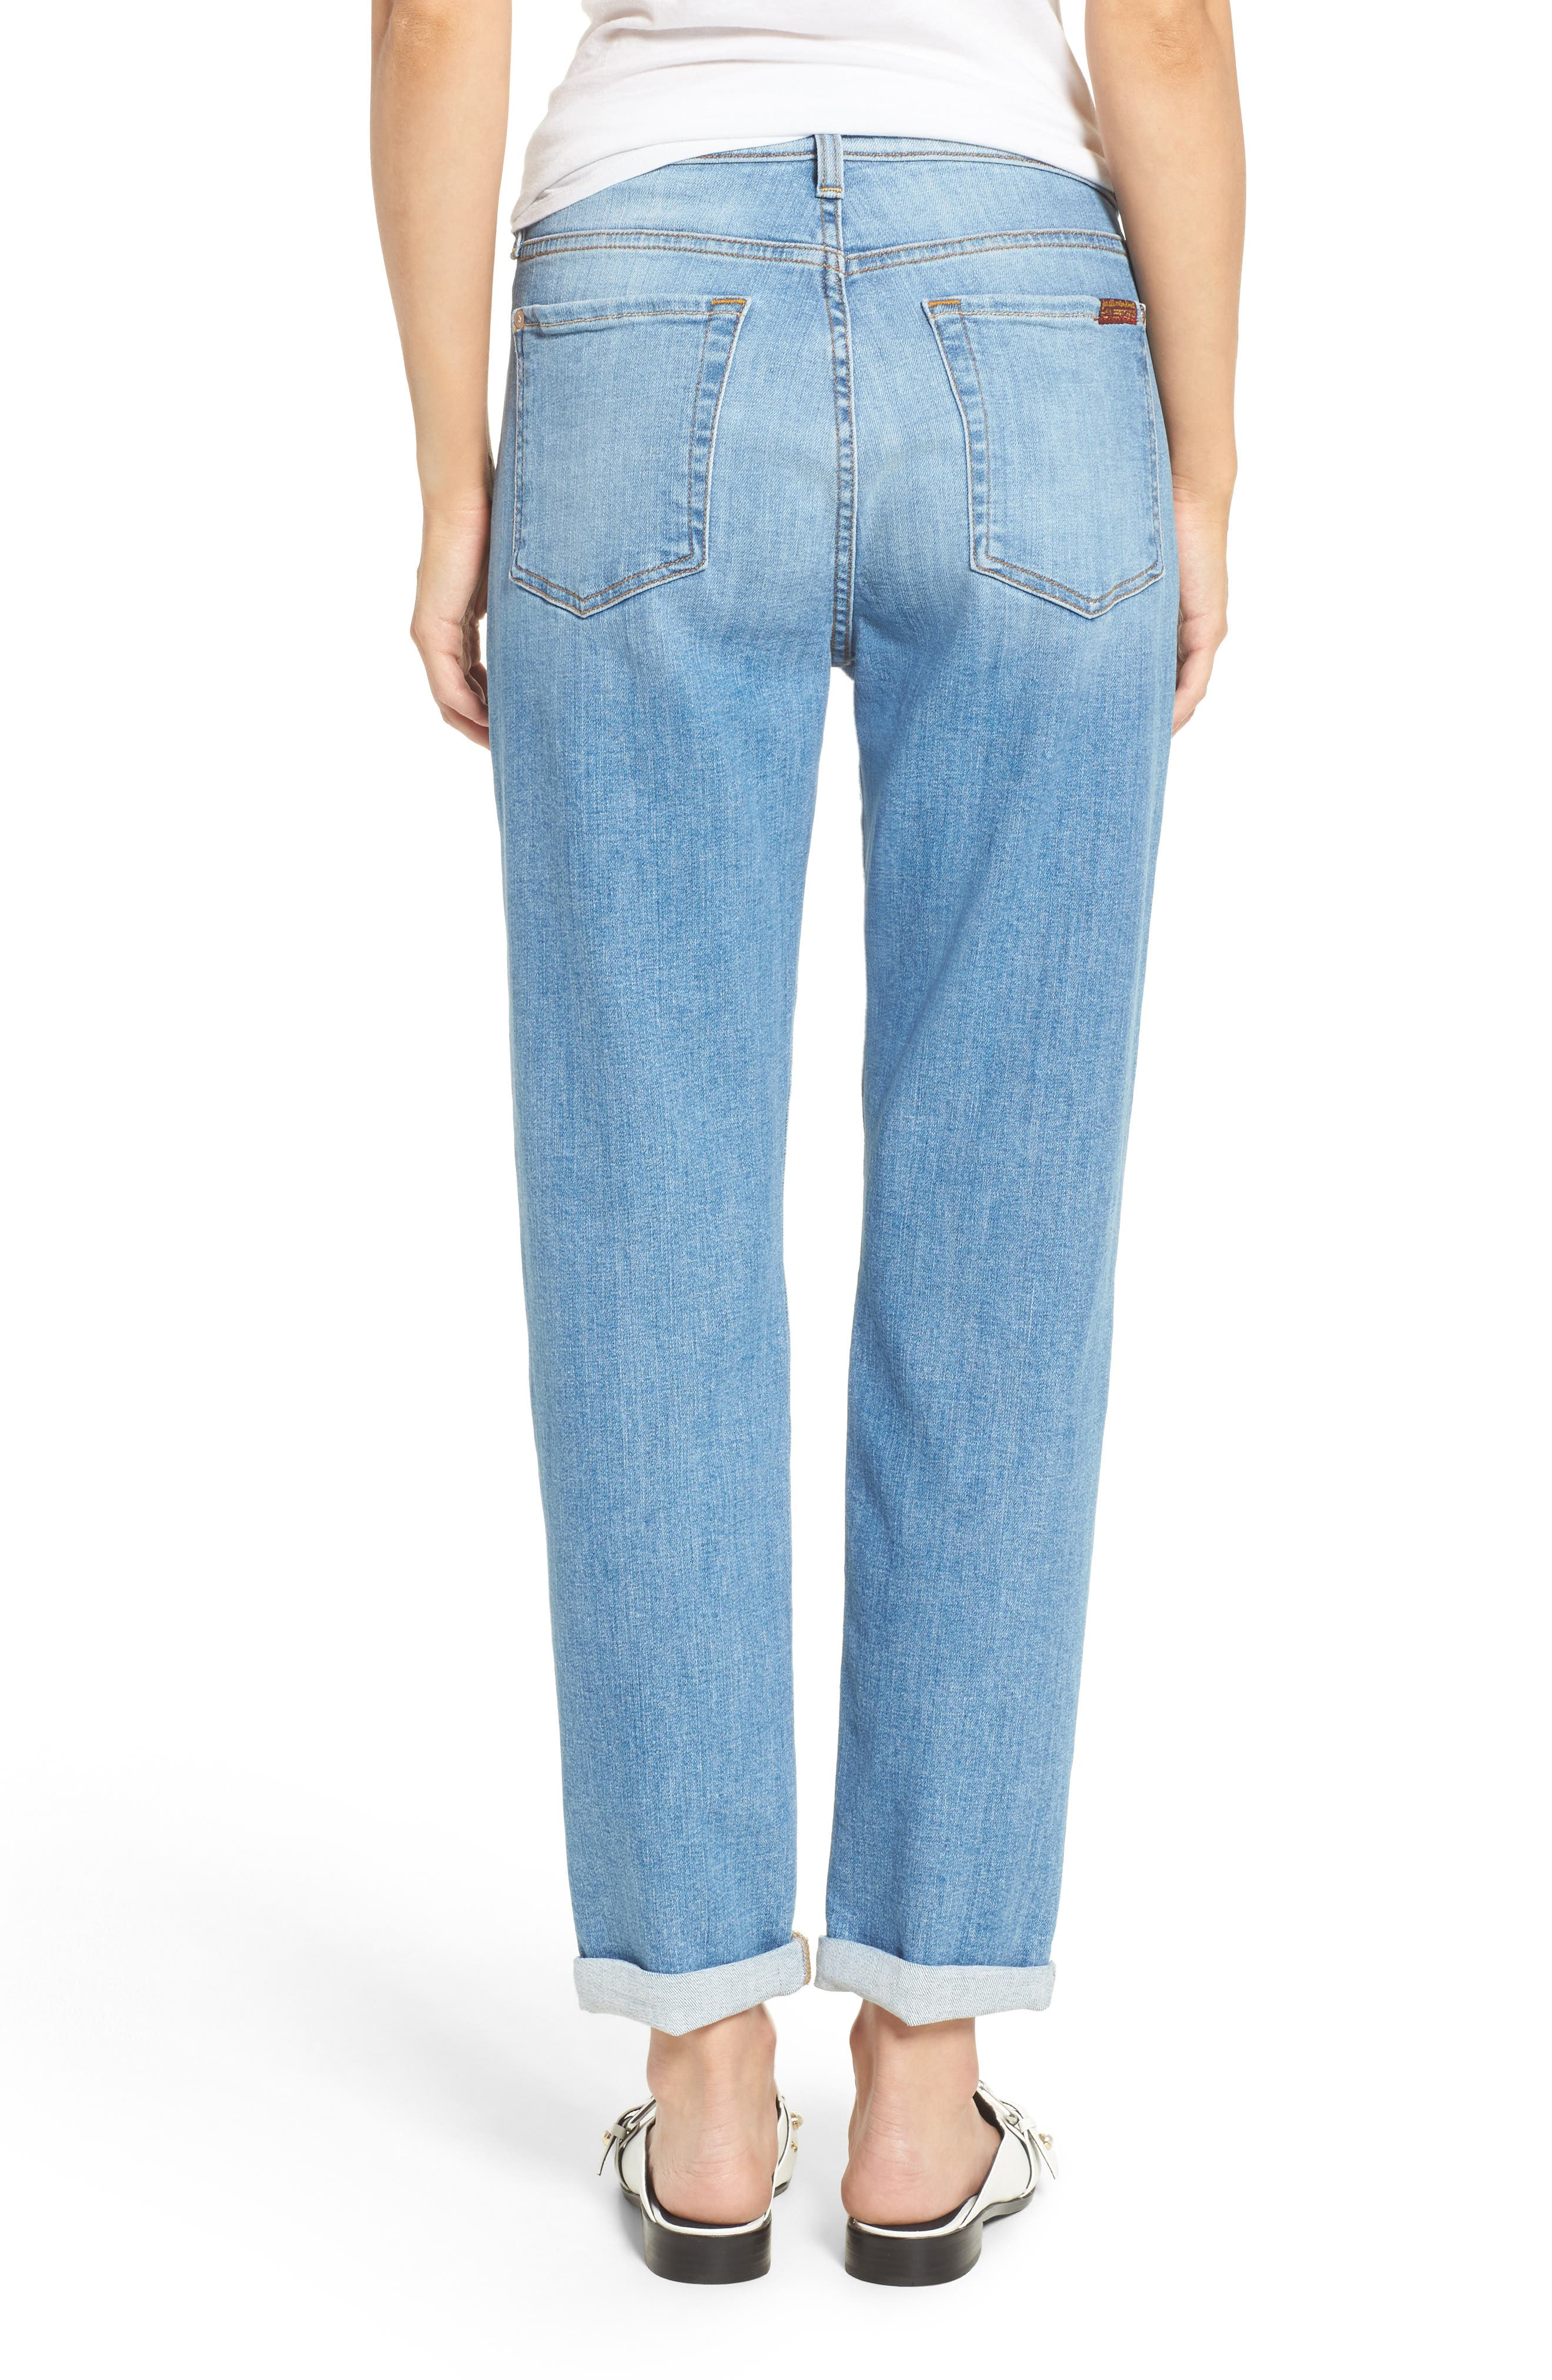 Josefina High Waist Crop Boyfriend Jeans,                             Alternate thumbnail 2, color,                             East Village